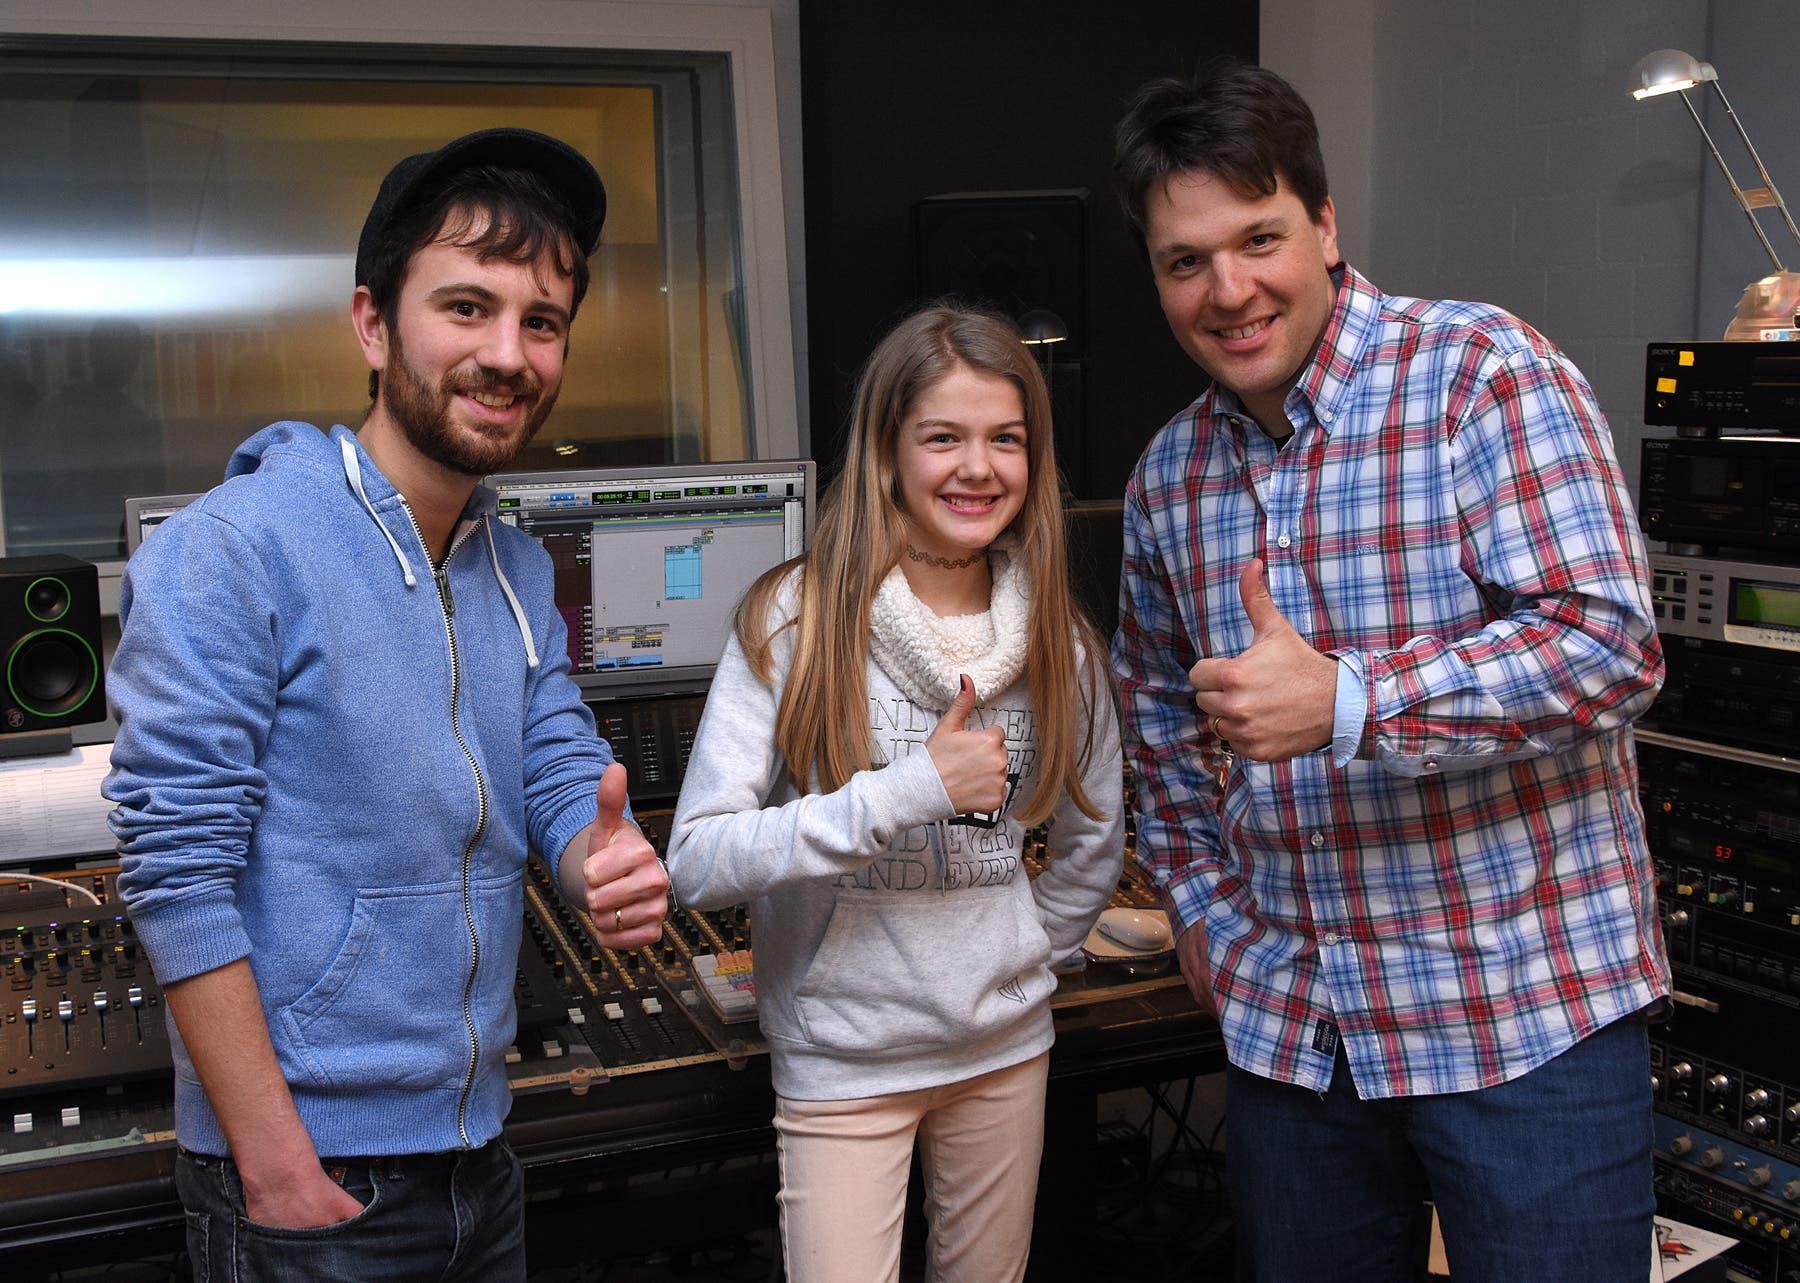 Im Studio in Zuchwil: Radio32-Moderator Lüdi, Julia Jeker und Michael Vescovi